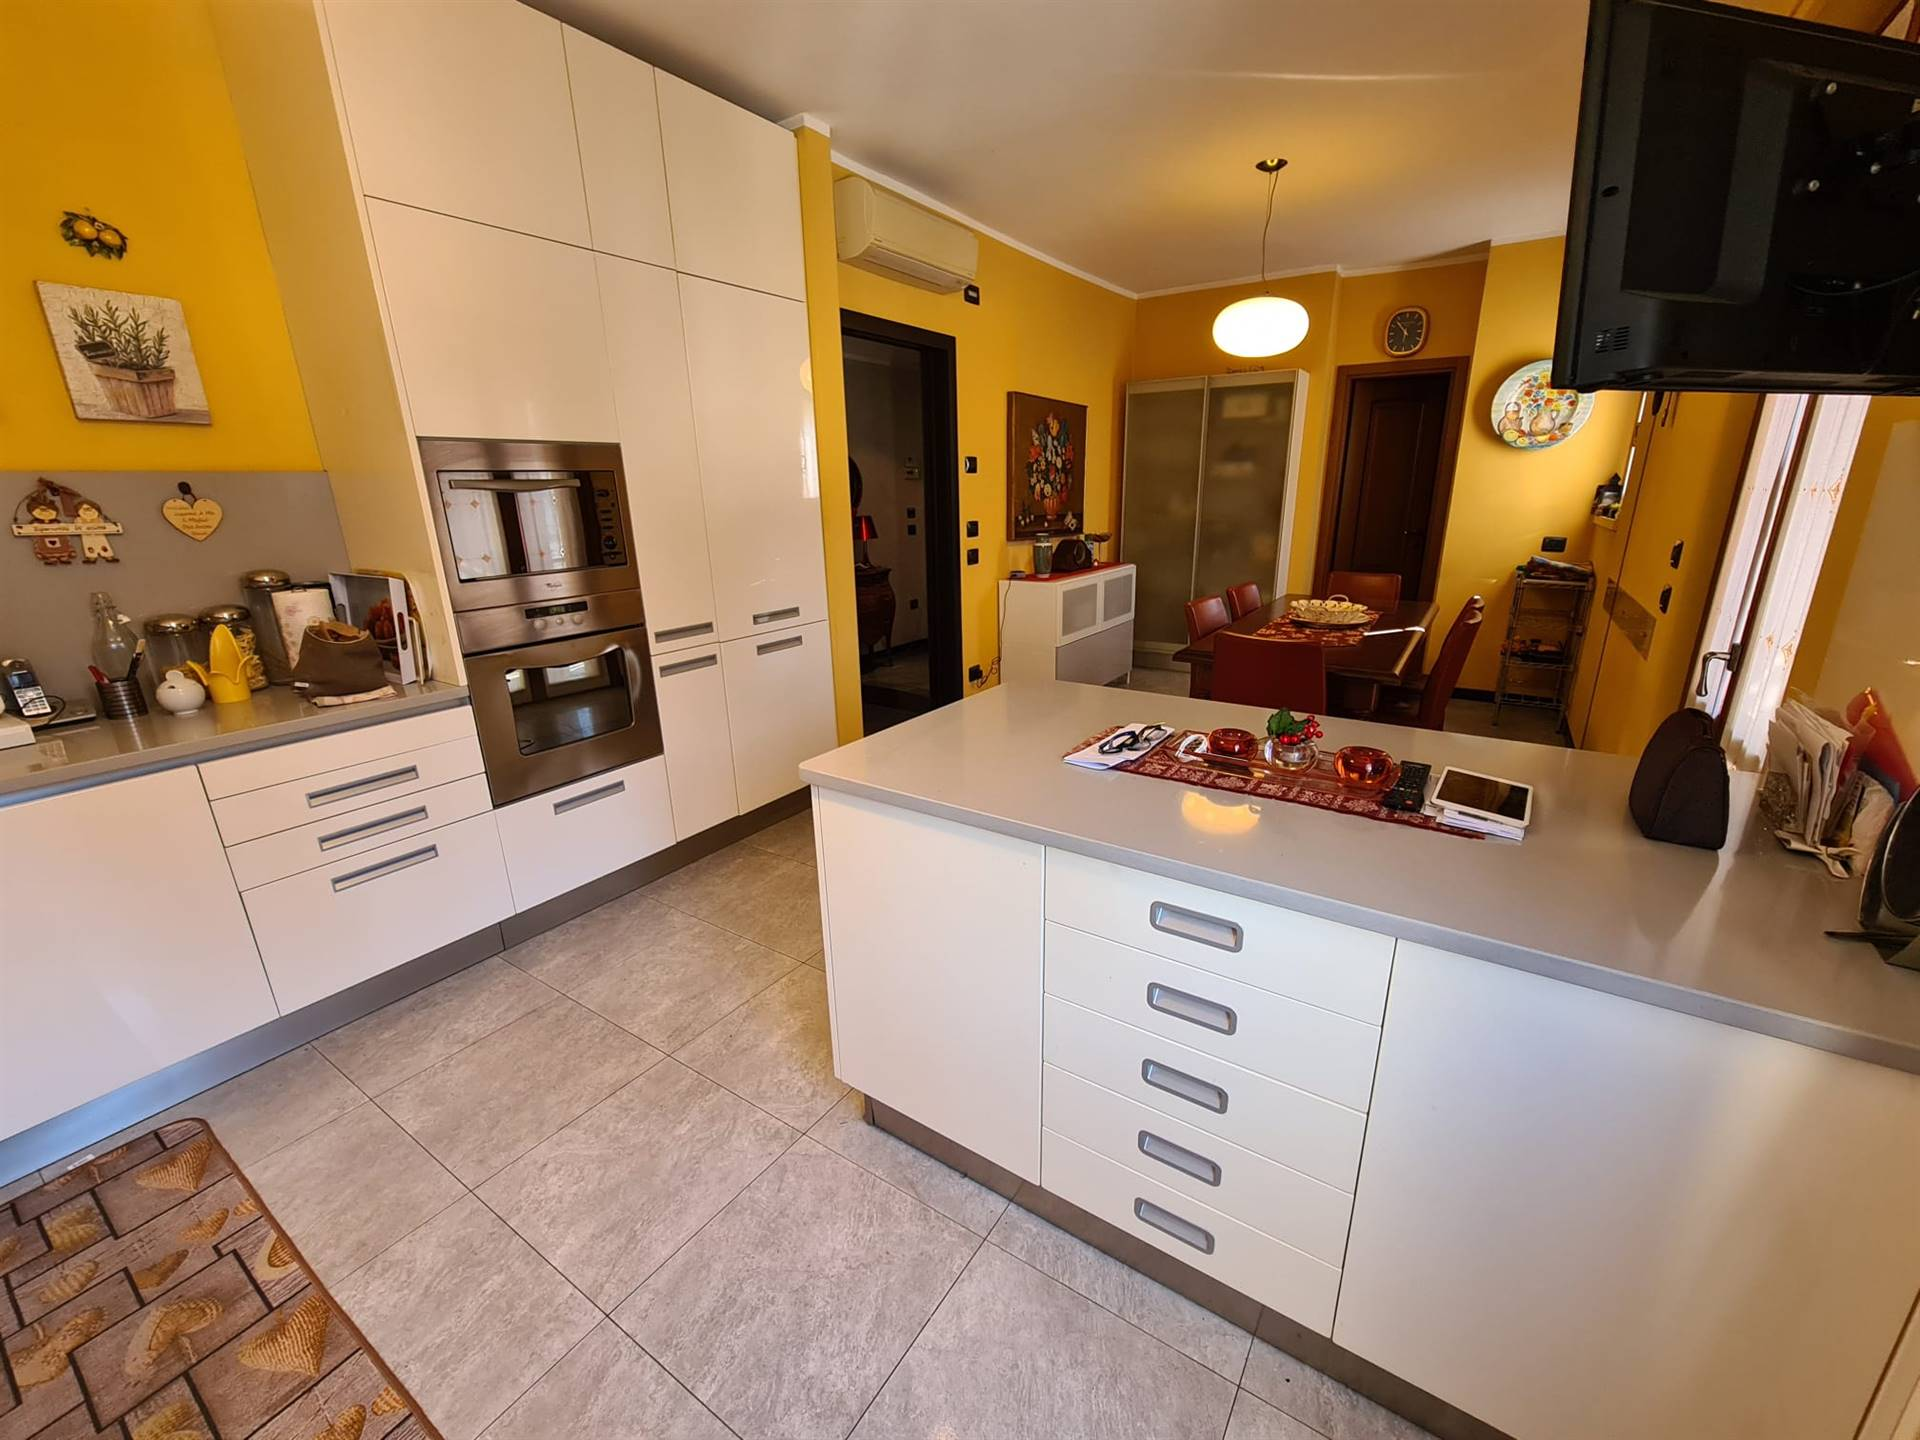 Cucina abitabile vista 3